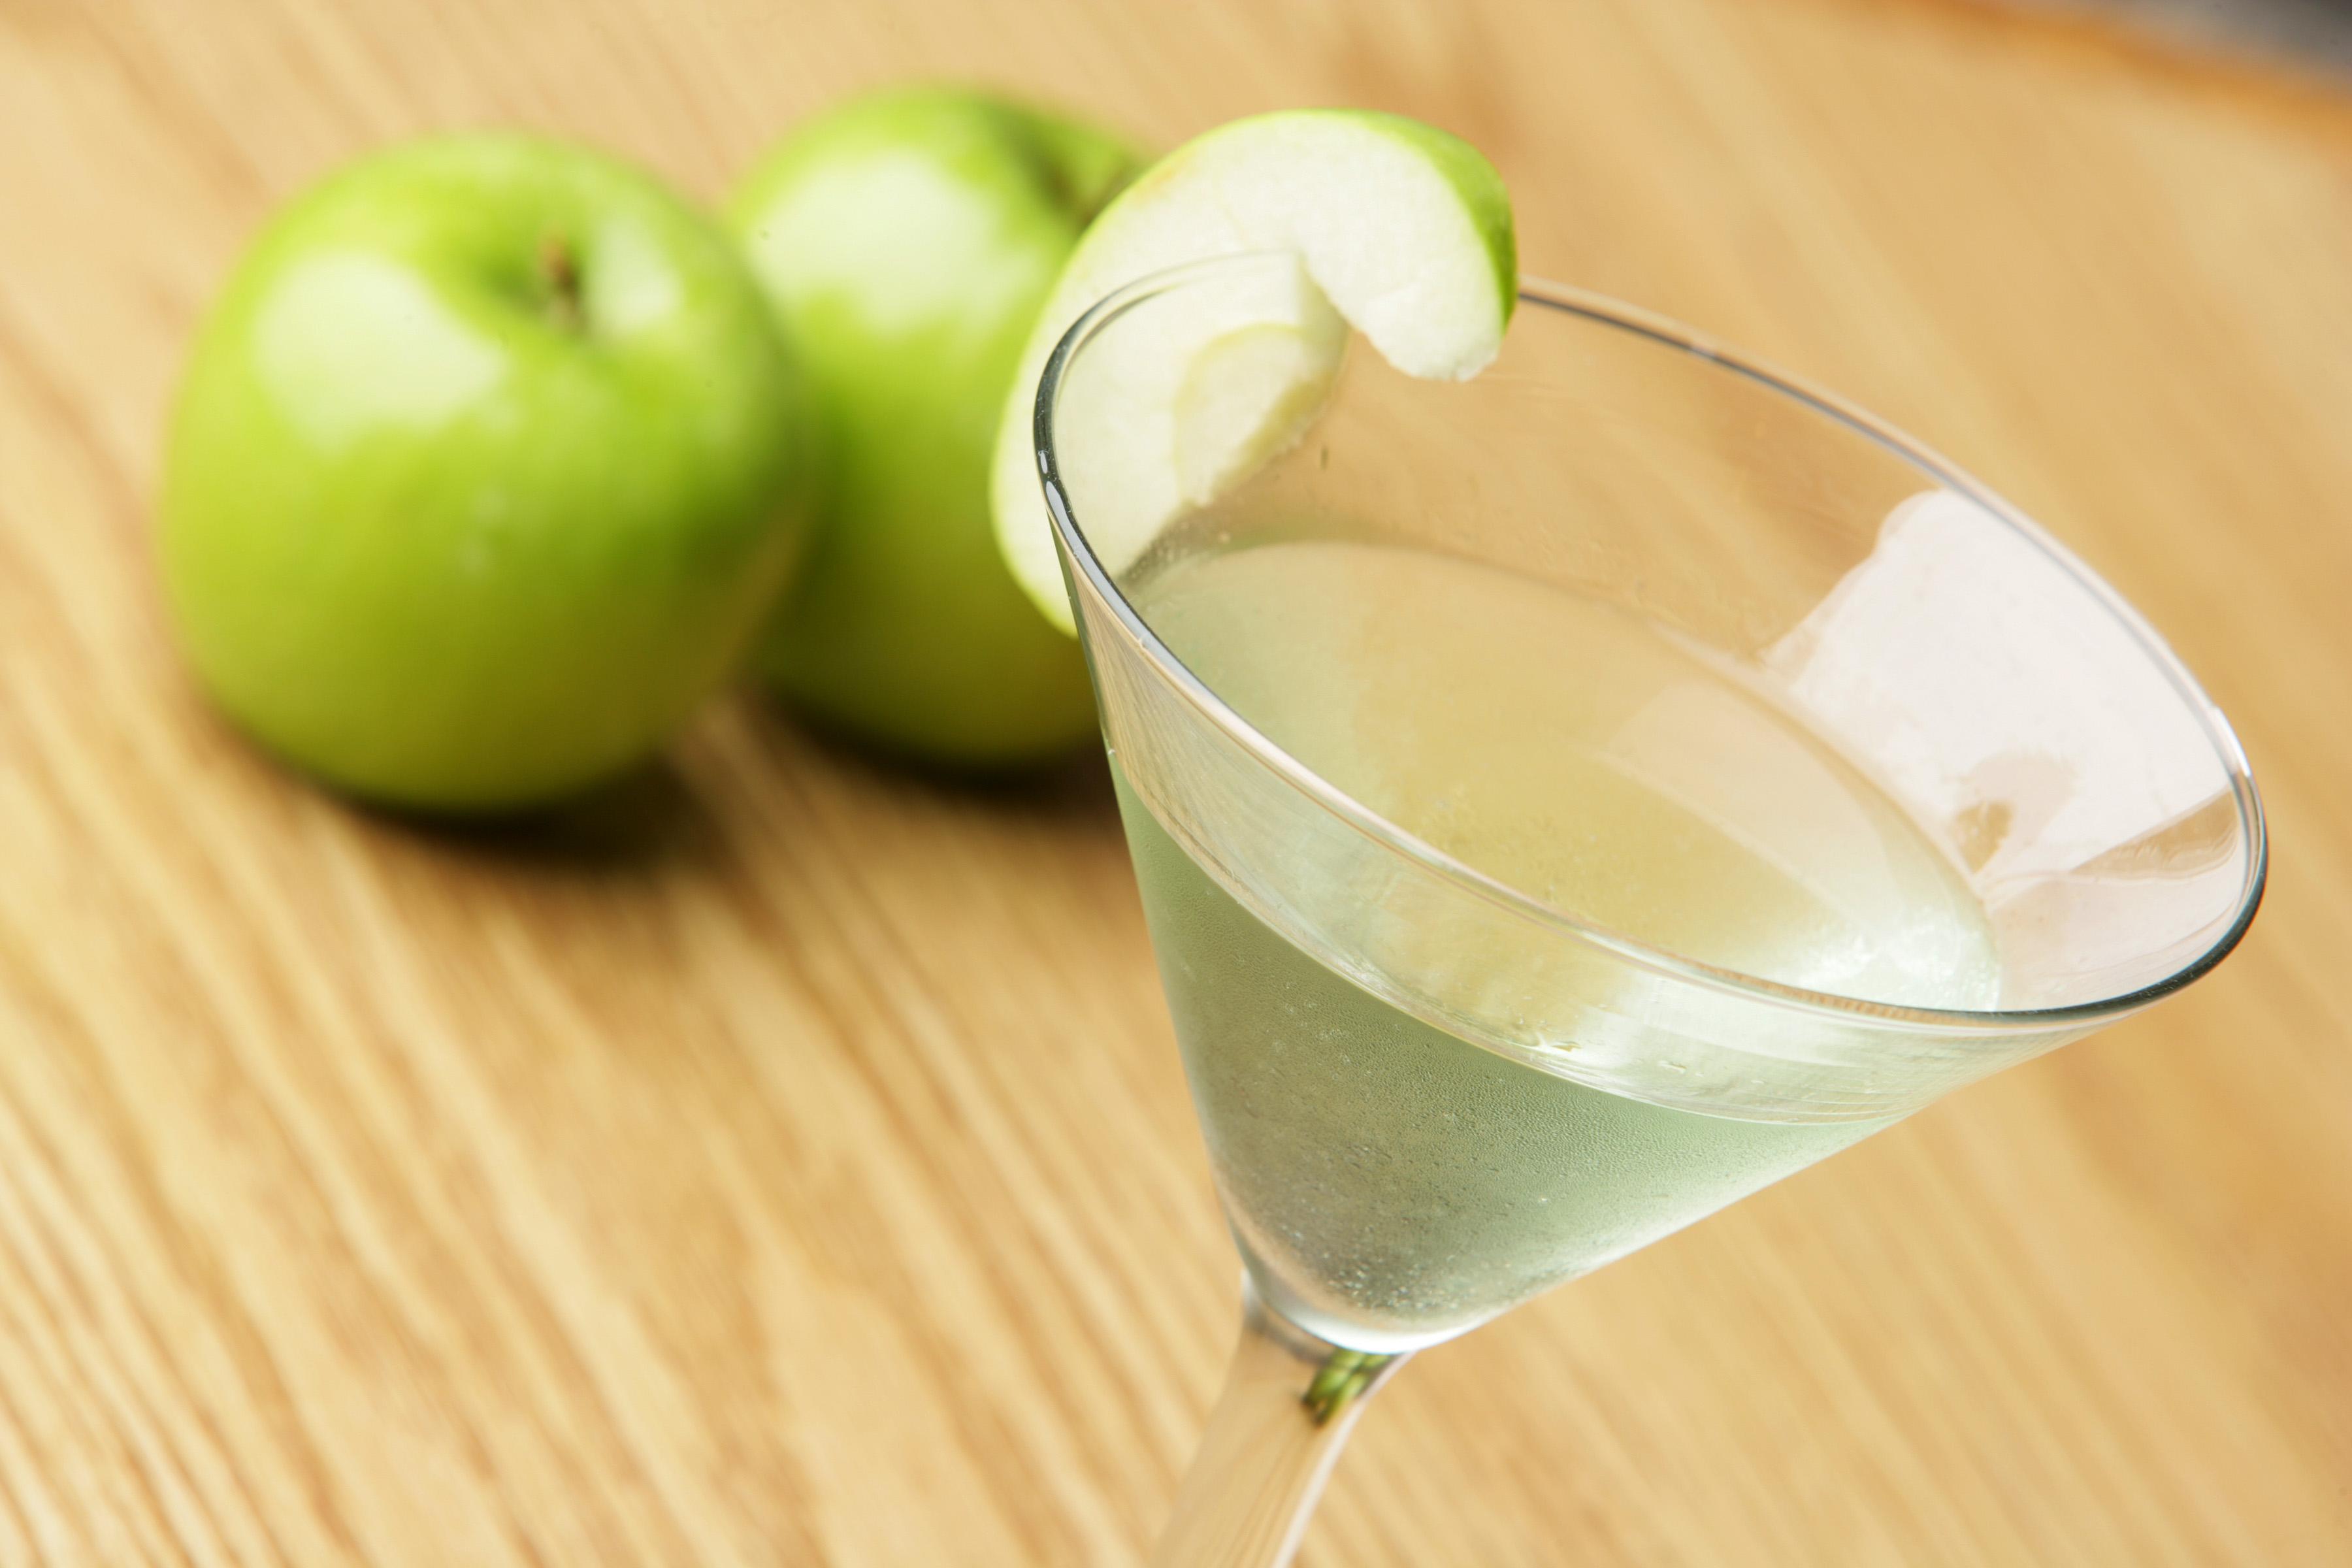 Canadian Apple Martini